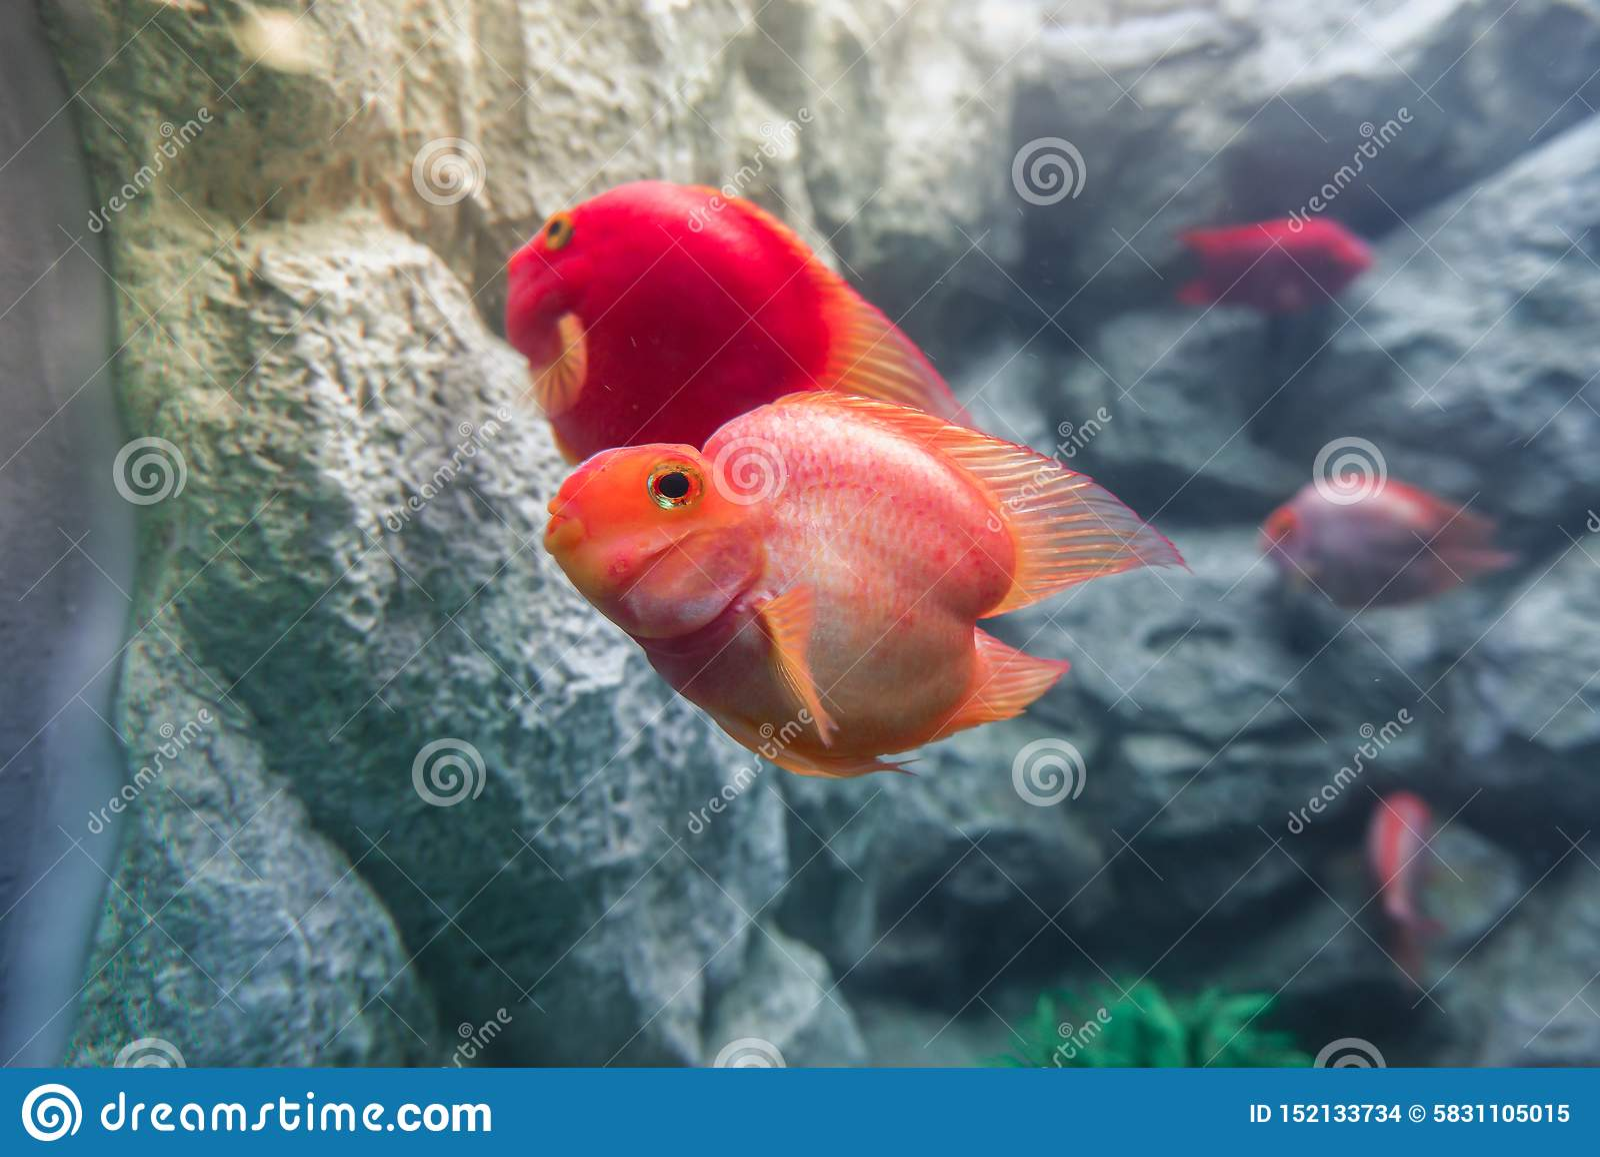 Sluit van van de vissenamphilophus van de bloedpapegaai cichlid citrinellus x Paraneetroplus-omhoog synspilus